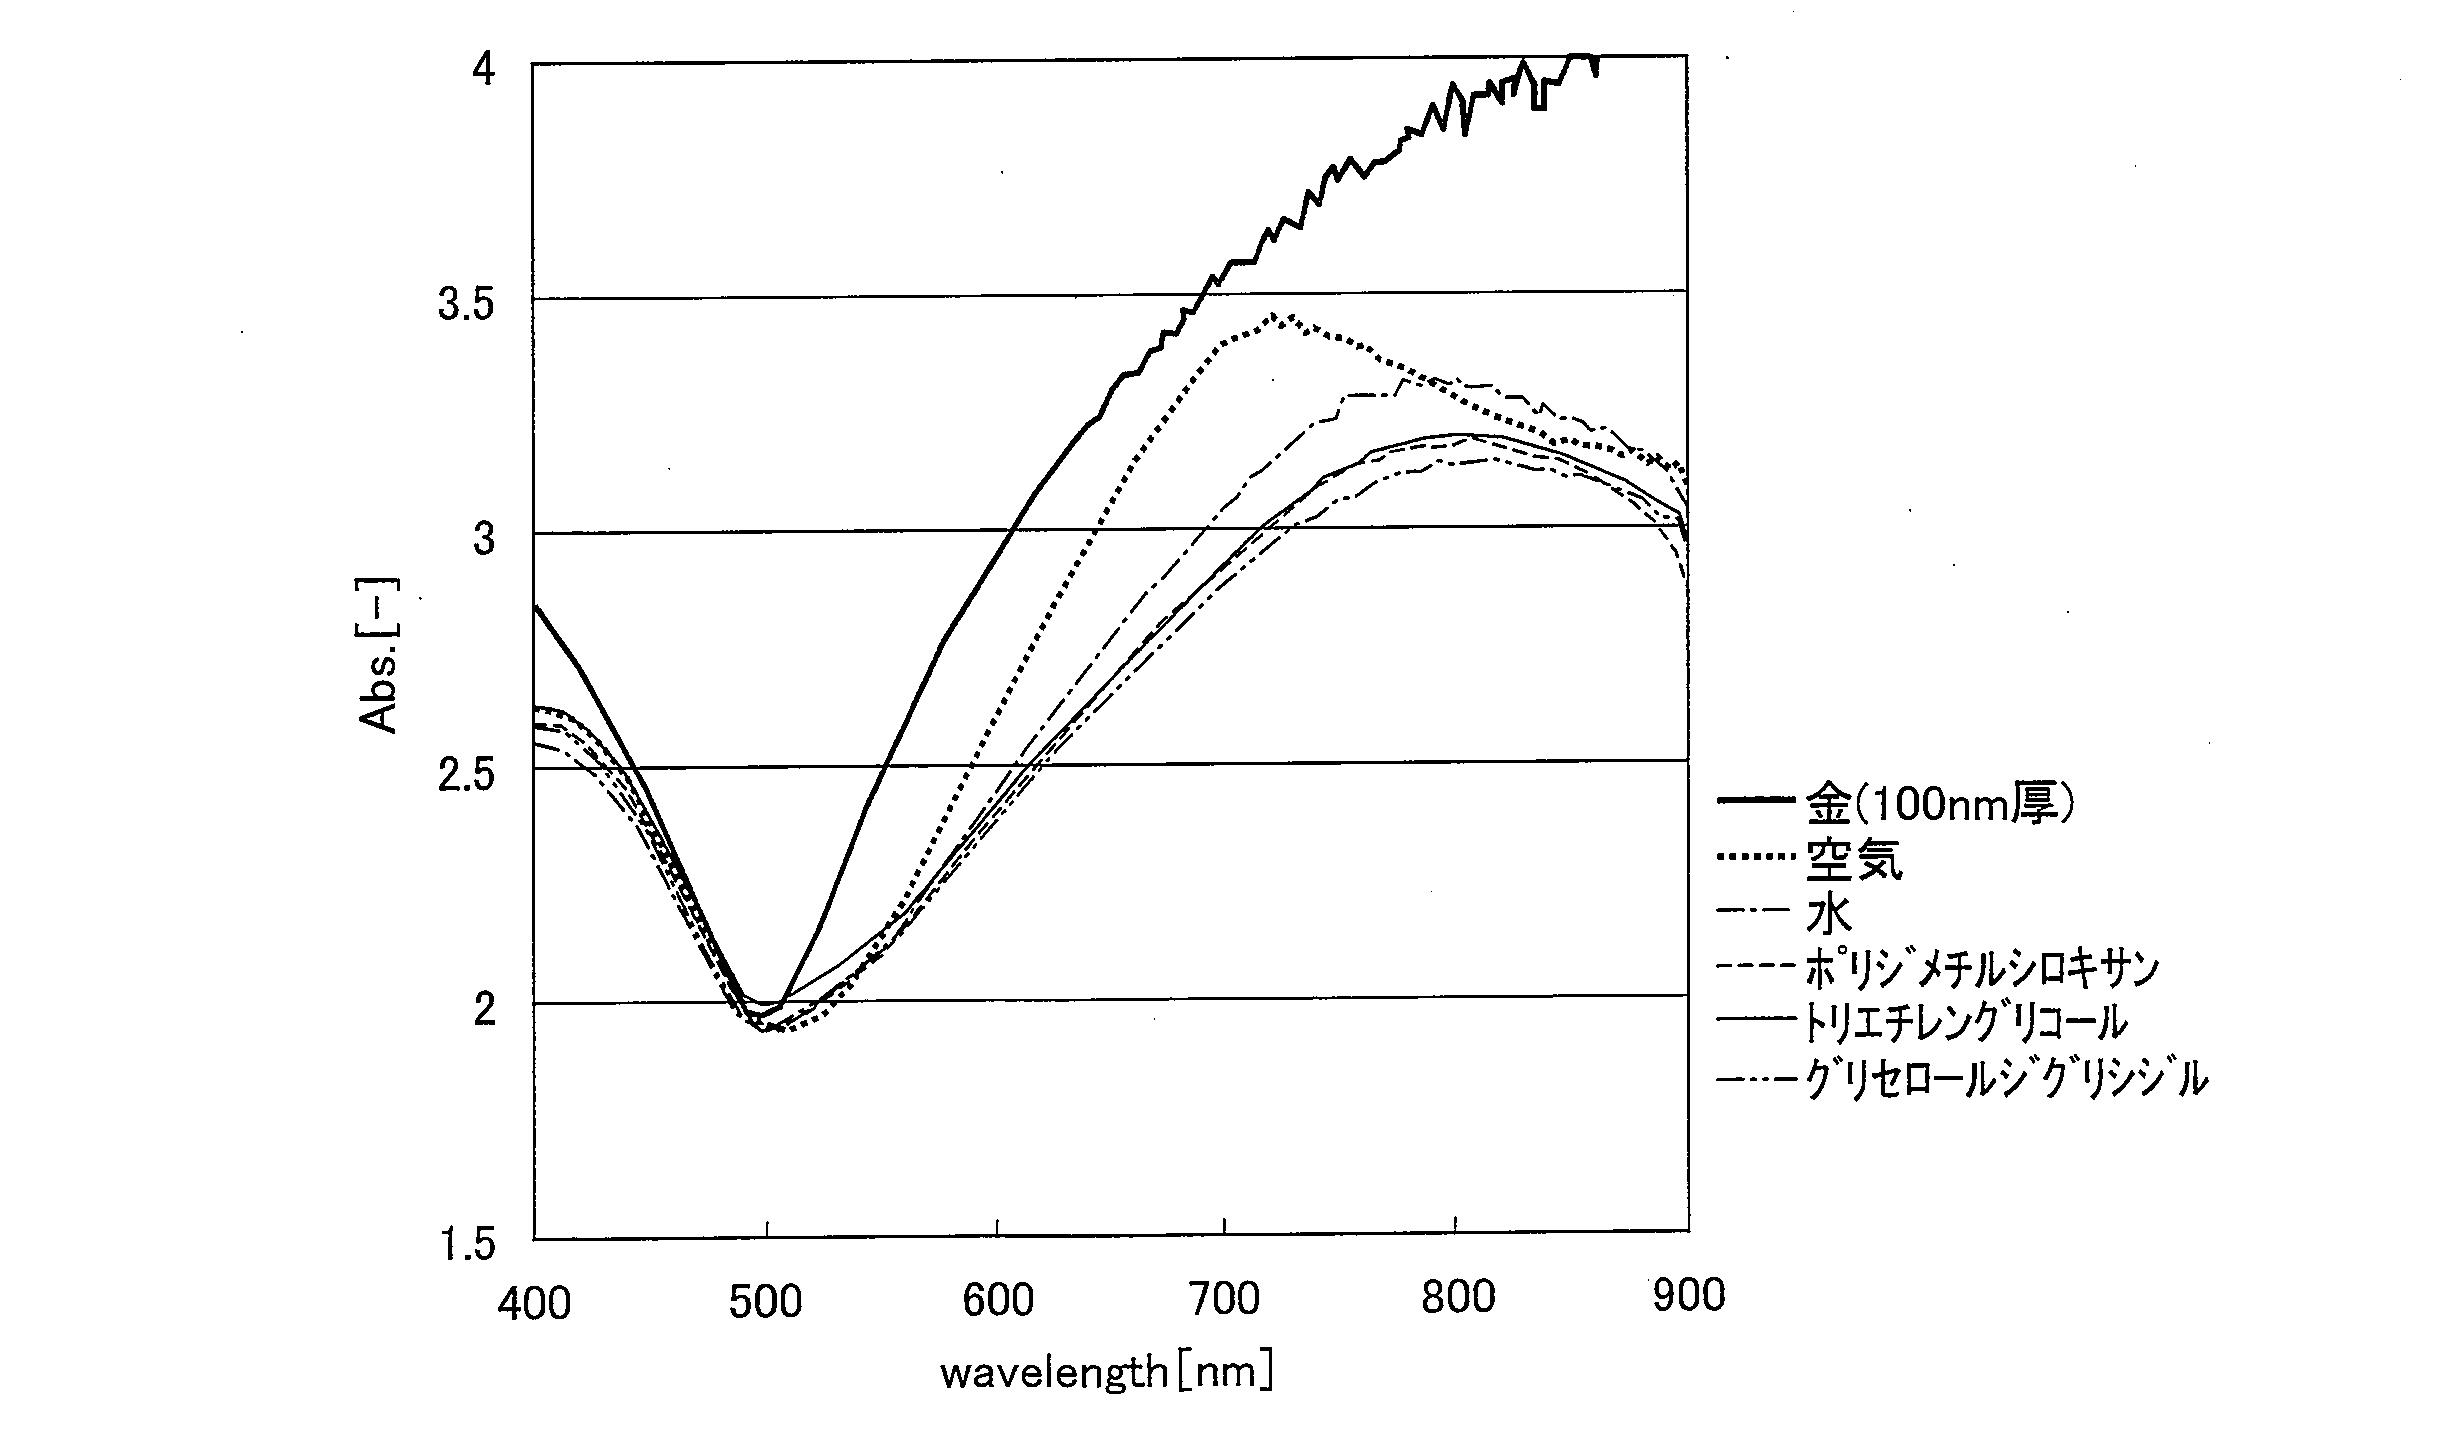 WO2011121857A1 - 構造体、局在型表面プラズモン共鳴センサ用チップ、及び局在型表面プラズモン共鳴センサ、並びにこれらの製造方法          - Google PatentsFamily